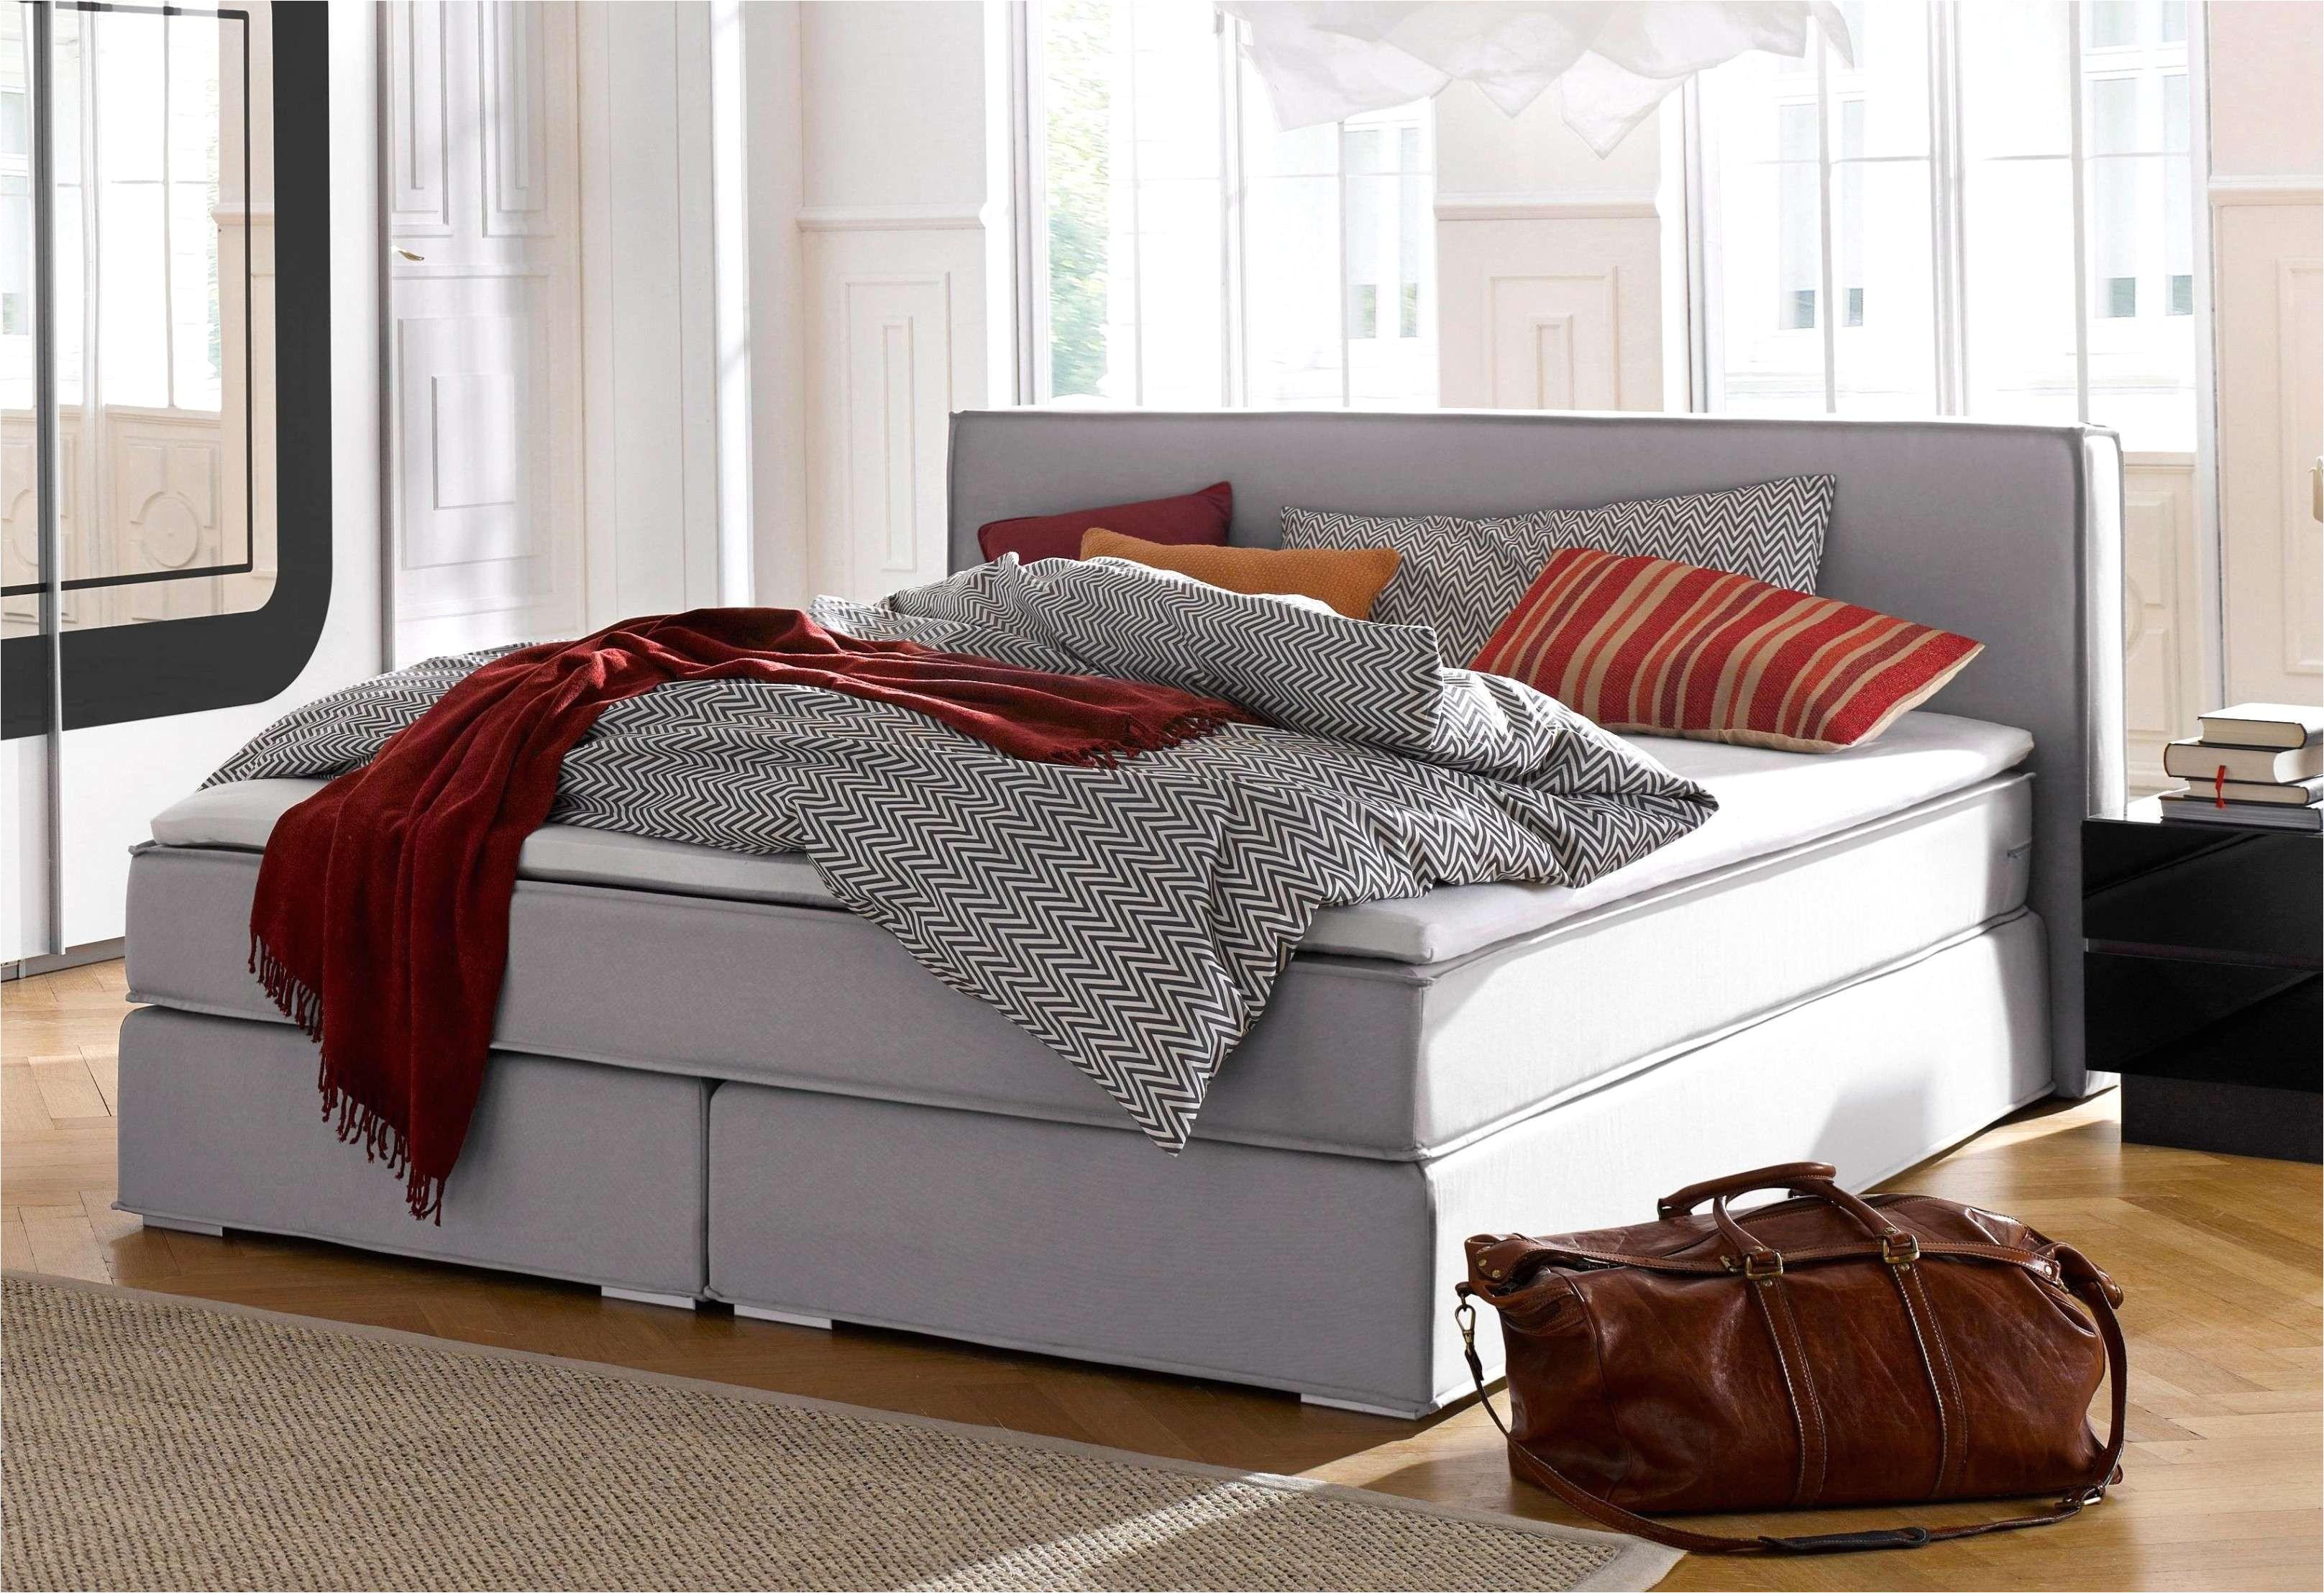 bed sheet sizes fresh polsterbett 100 200 mit bettkasten bestevon hohere betten 0d 27 27 inspirational bed sheet sizes from king size vs queen